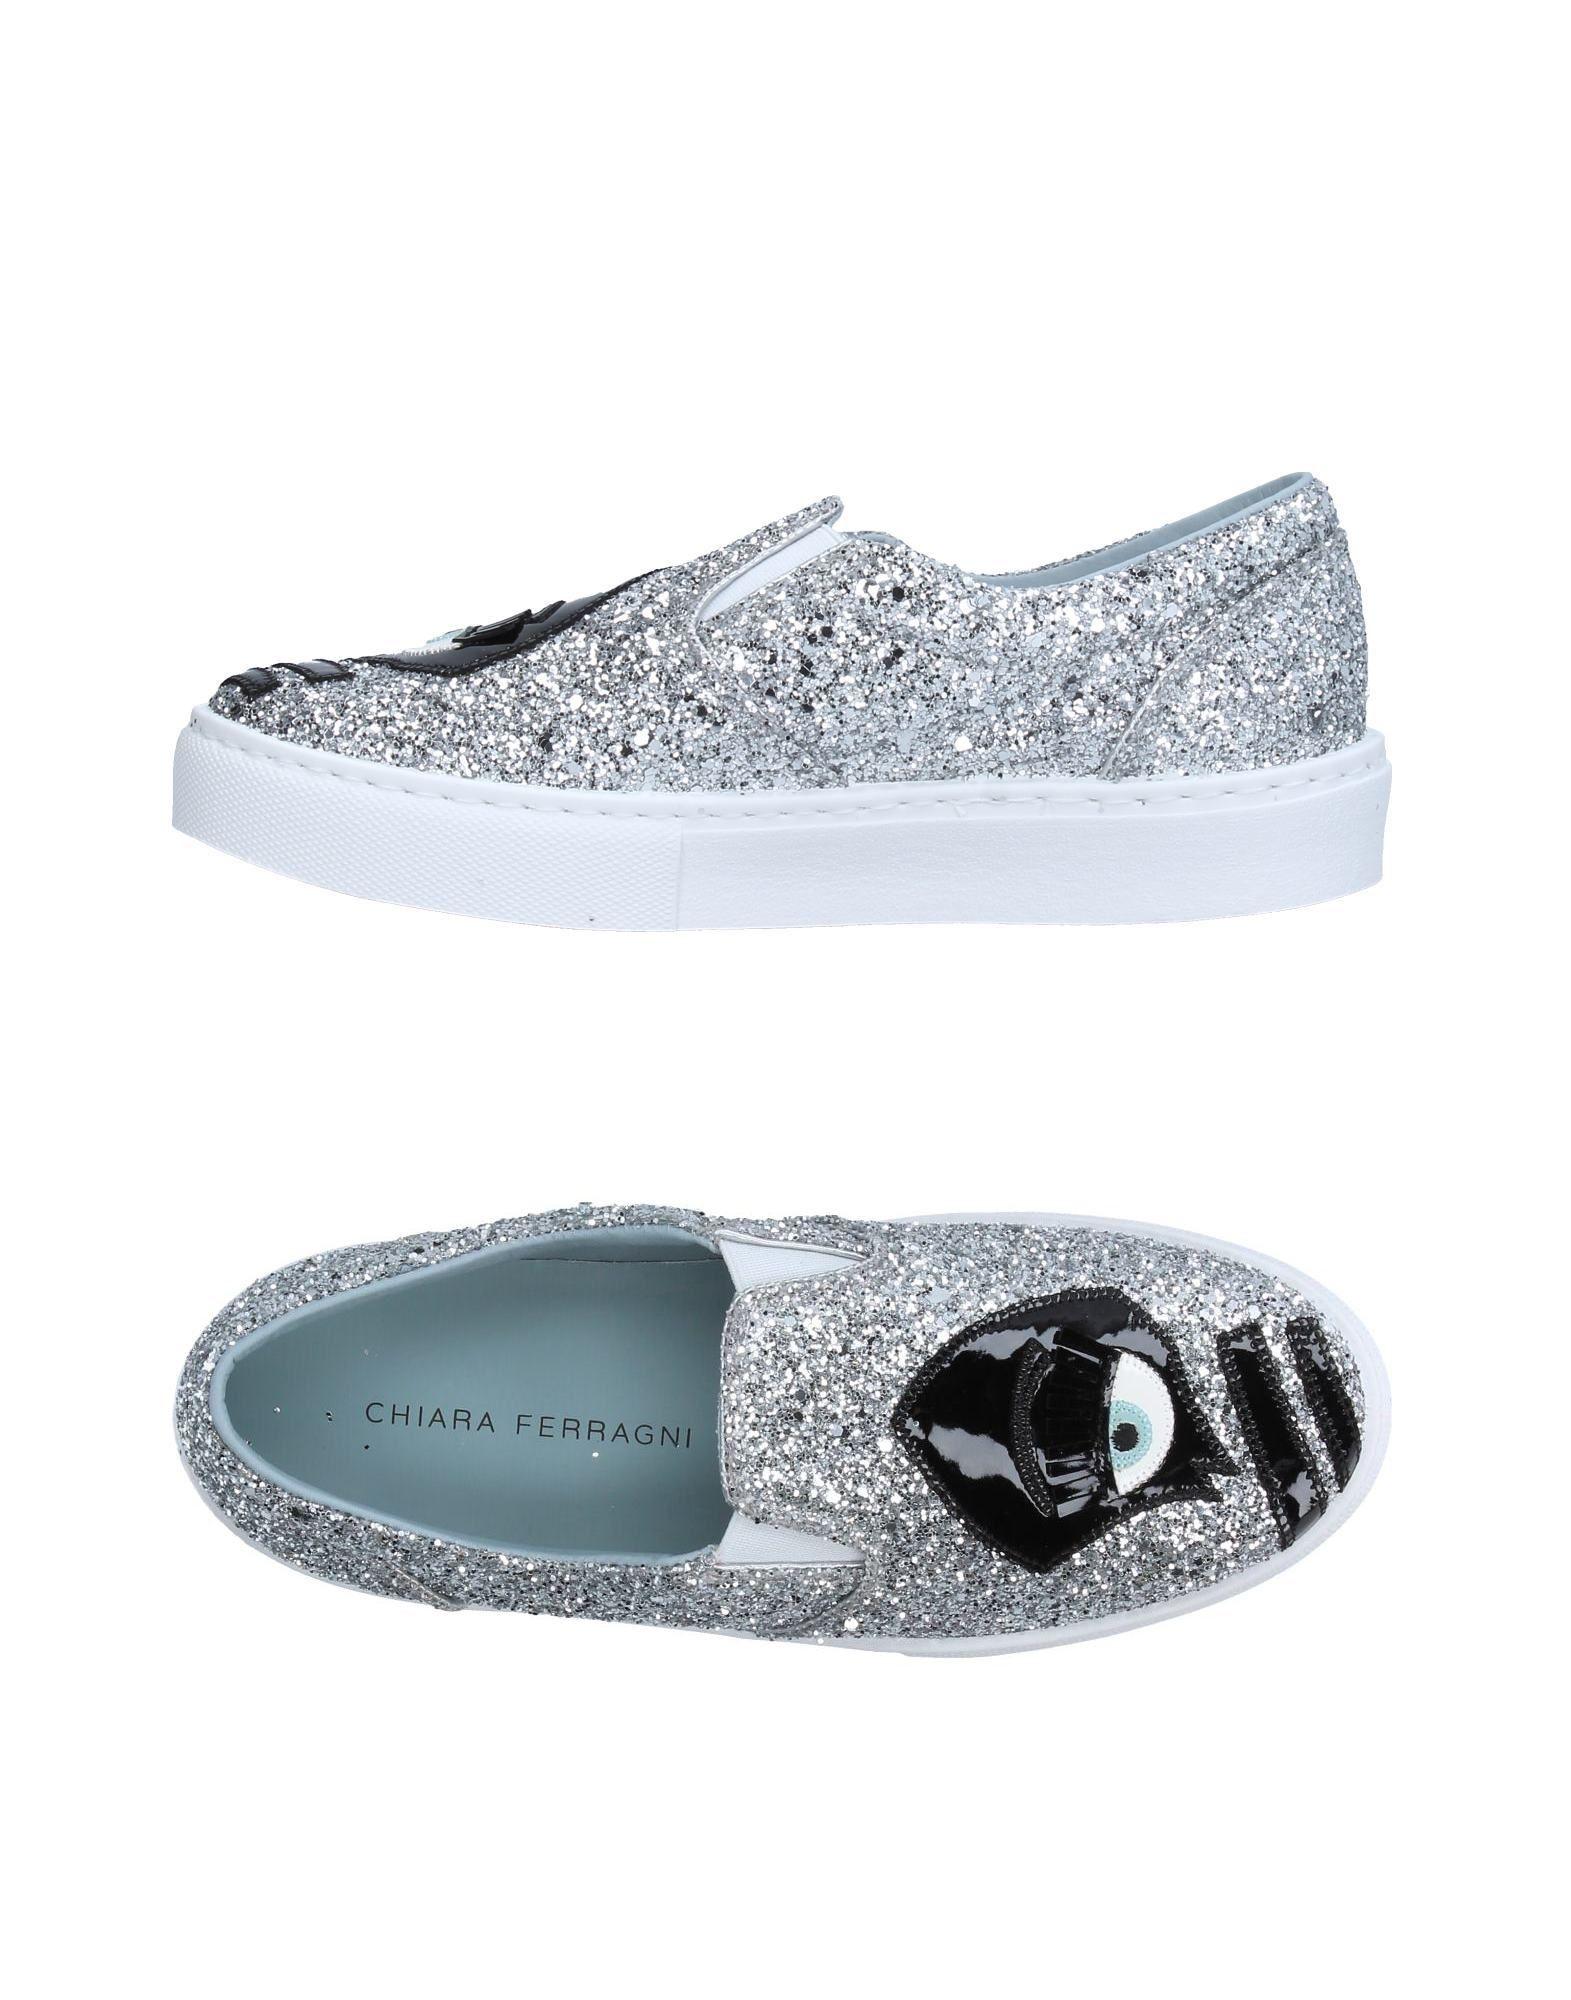 Chiara Ferragni Sneakers Damen  11227066GG Gute Qualität beliebte Schuhe